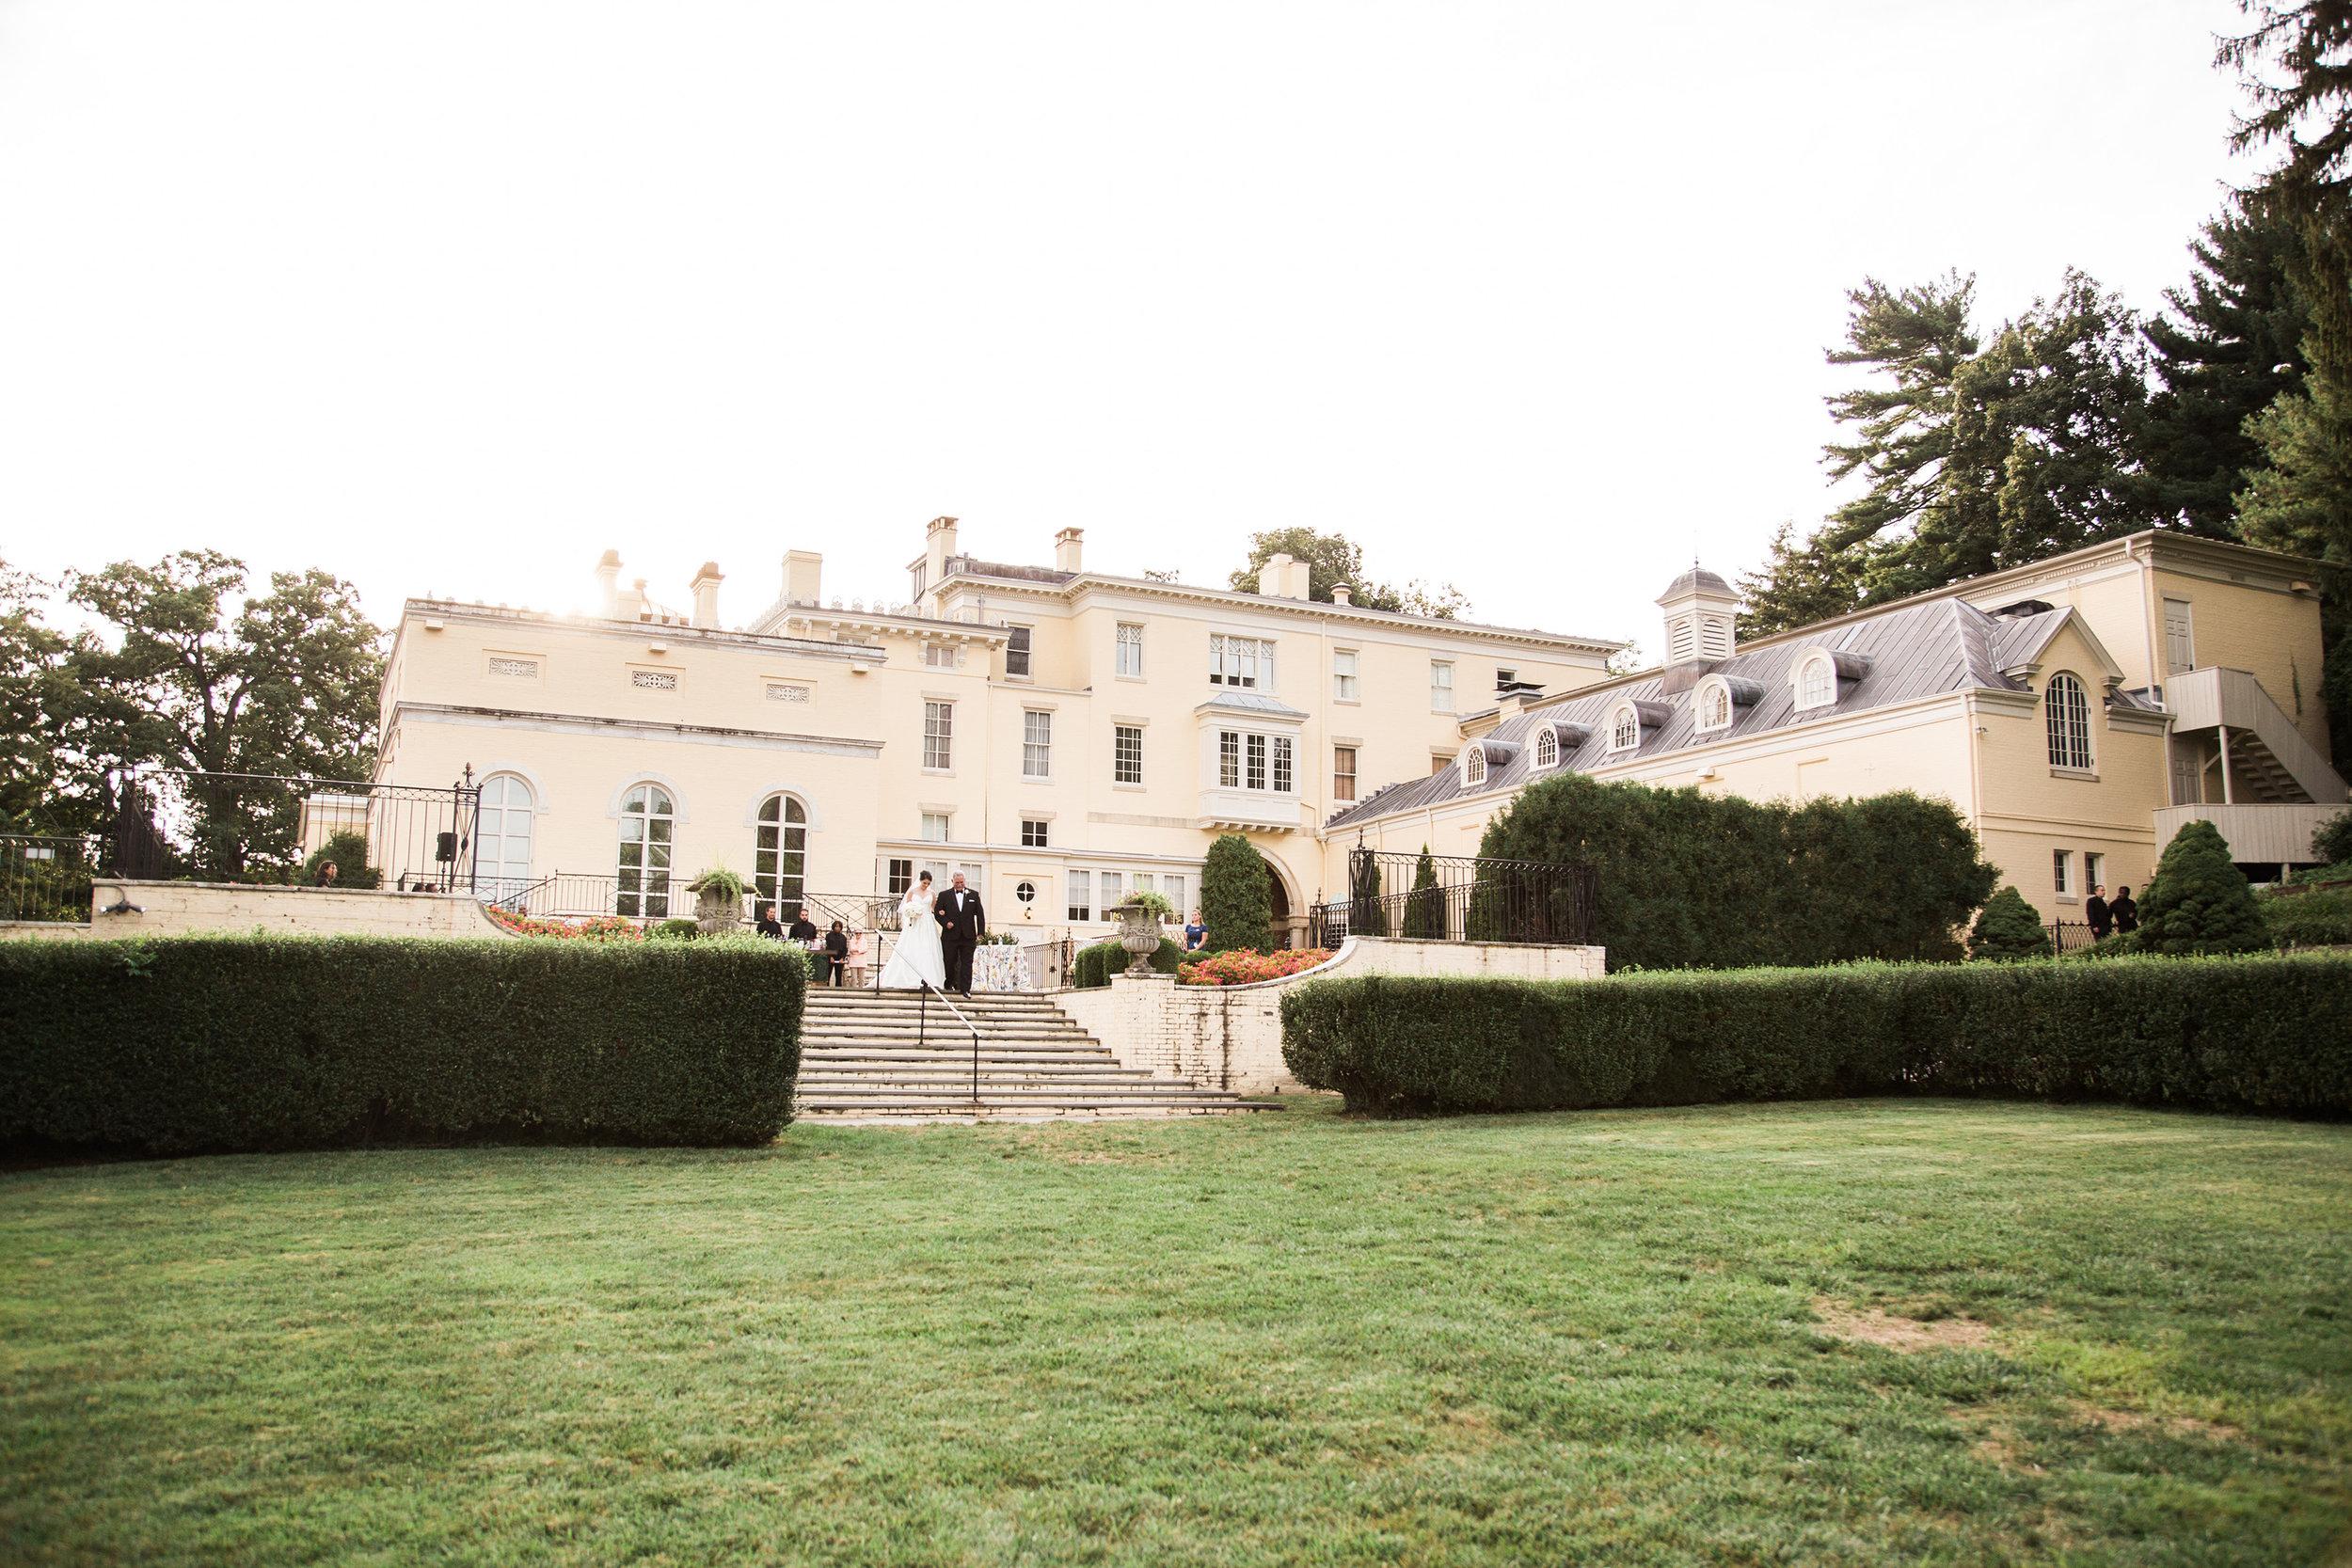 Evergreen-Museum-Balitmore-Maryland-Wedding-Black-Tie-Bride-027.jpg